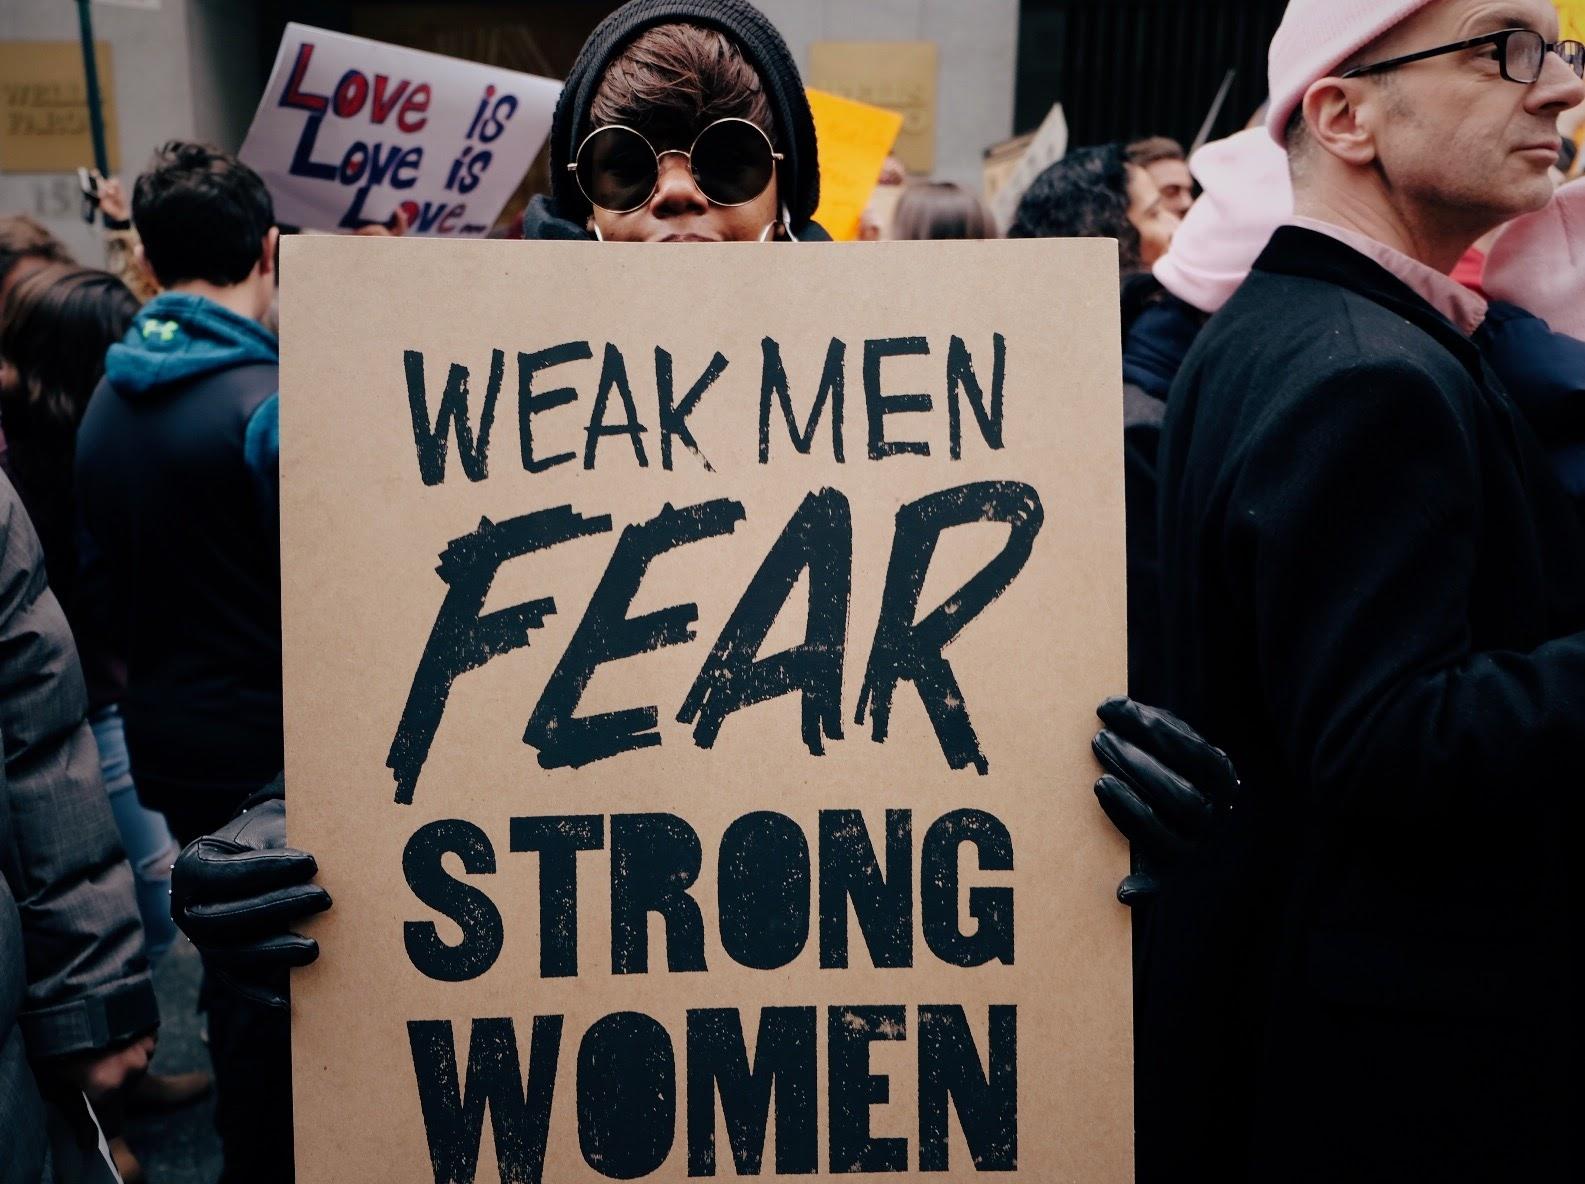 'weak men', 1.22.17